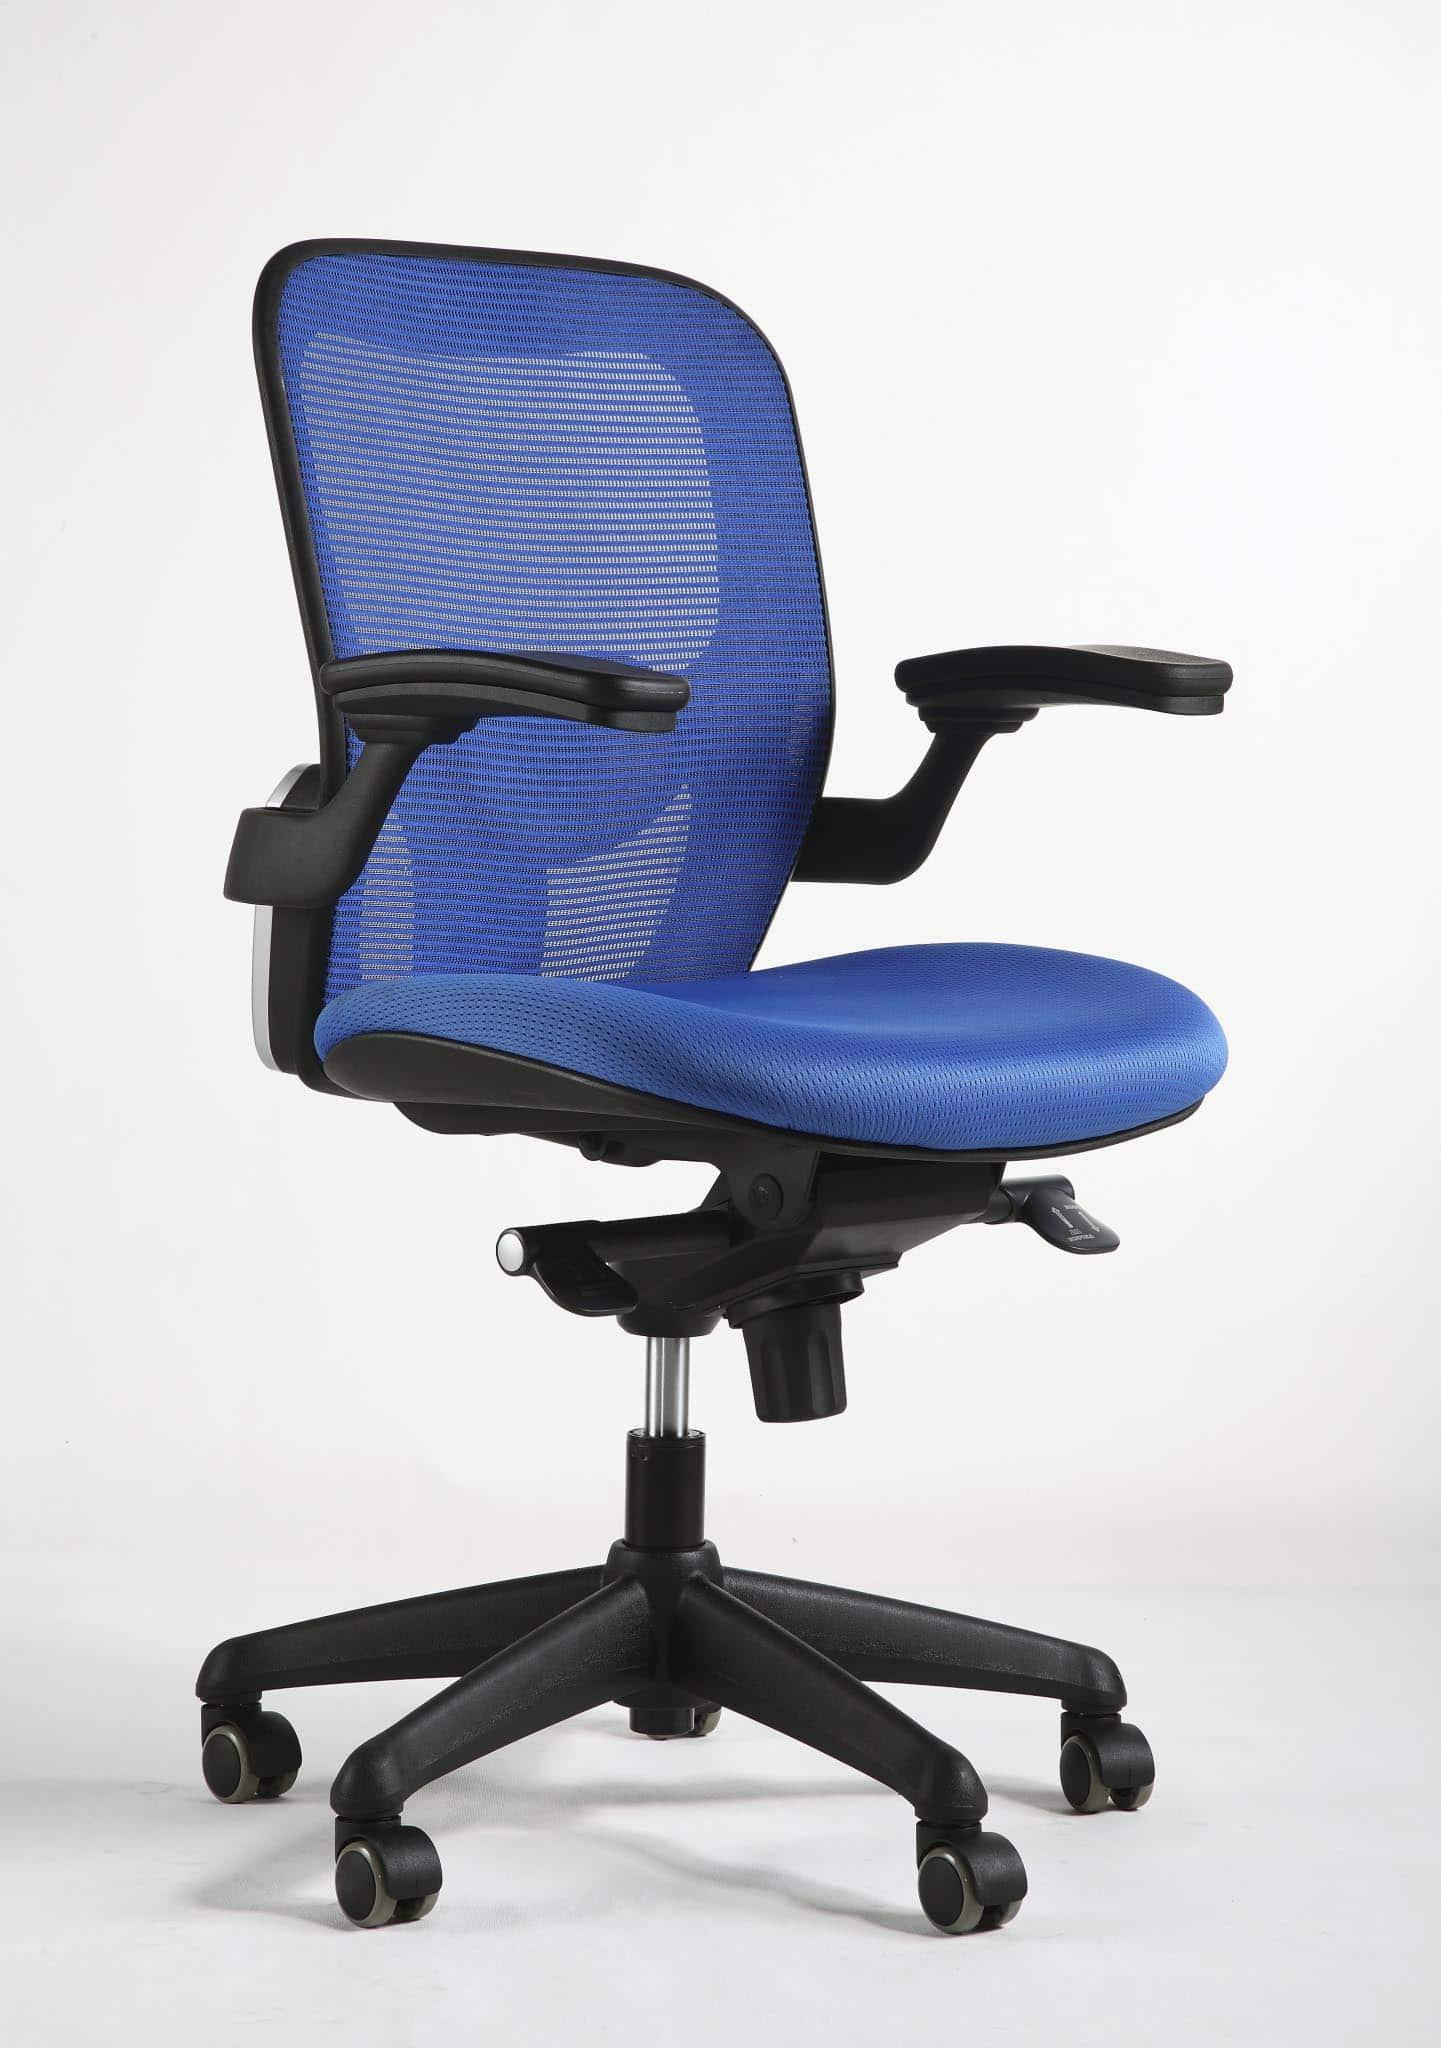 Sillas oficina ergon micas gioconda muebles de oficina for Sillas para oficina sodimac